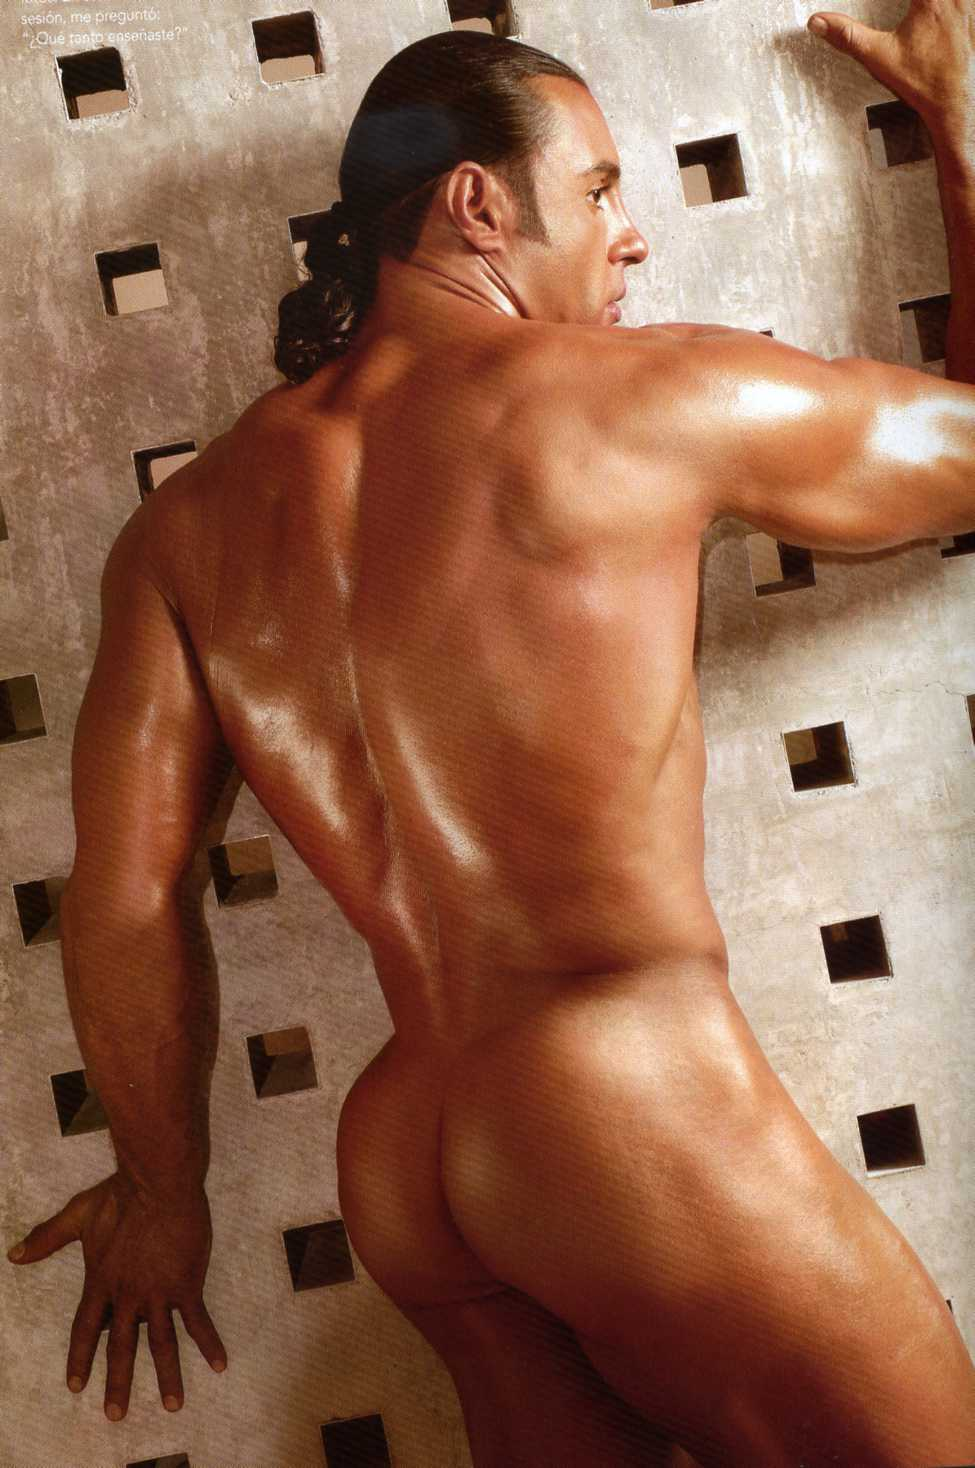 Adrian Actor Porno Desnudo nalgas de latin lover - soft porno movie